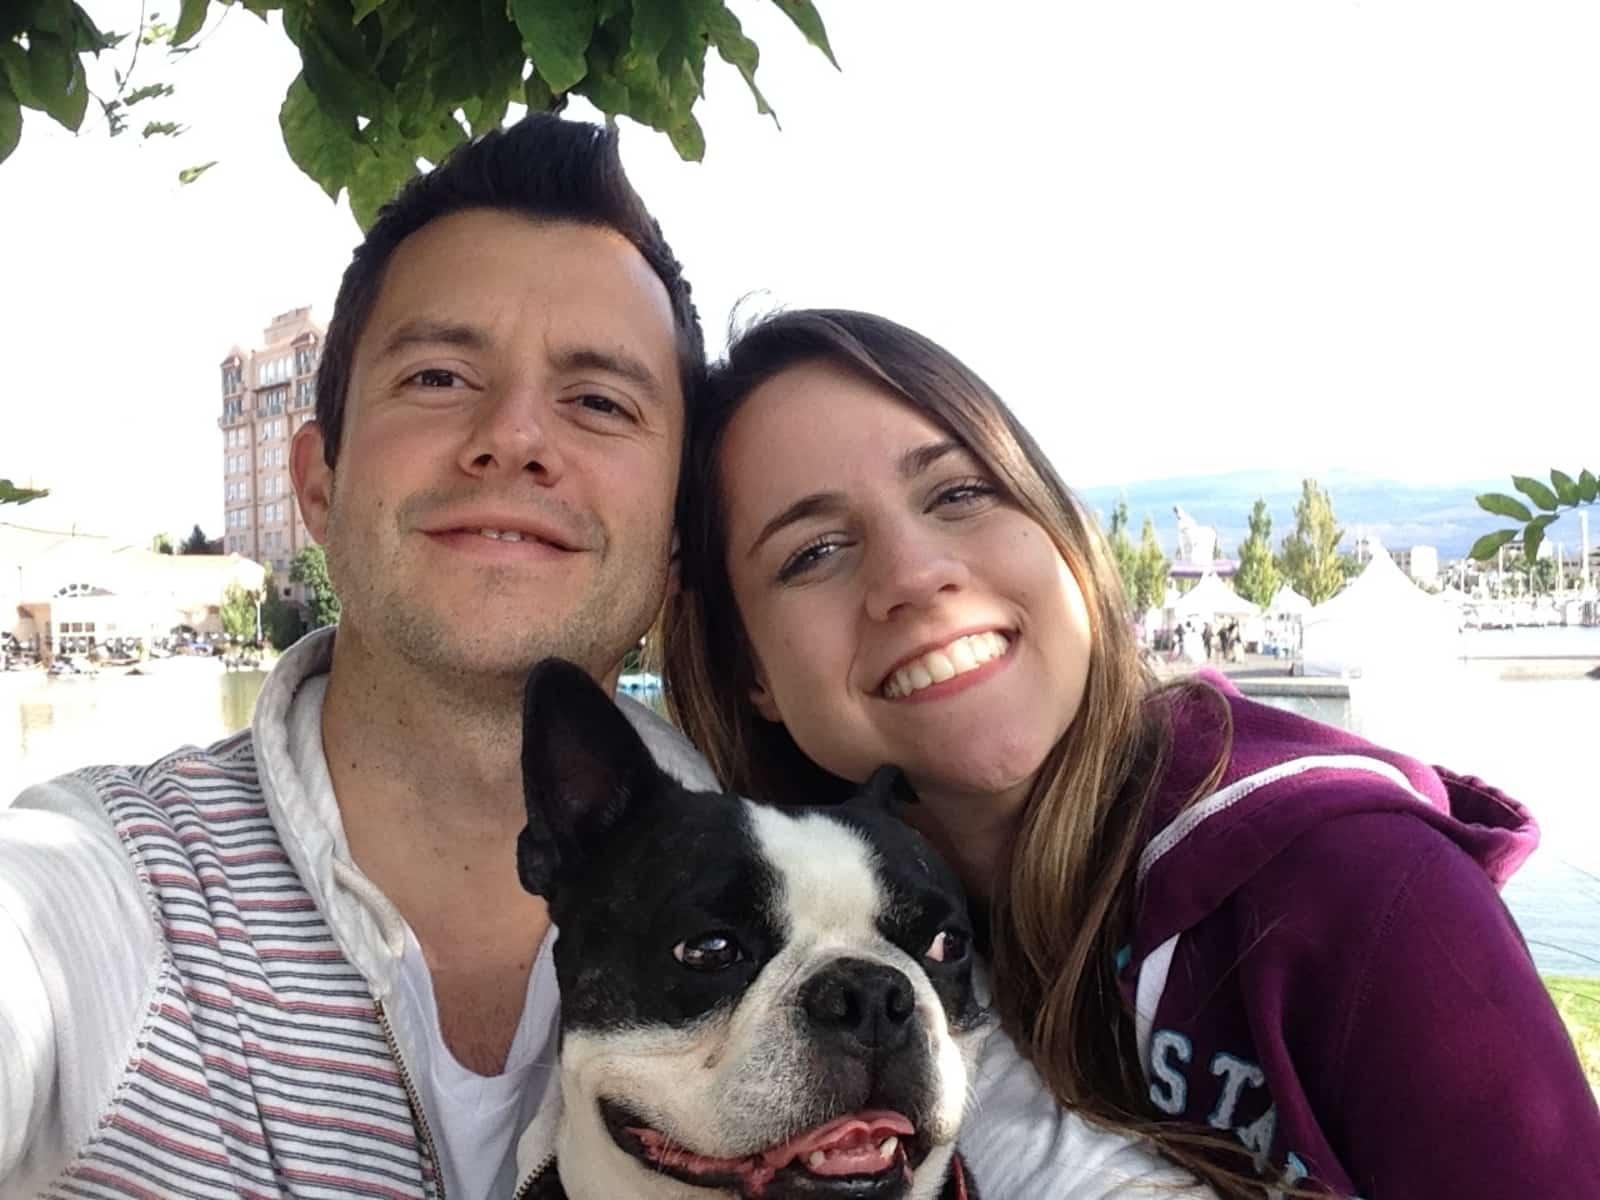 Caroline & Daniel from Vancouver, British Columbia, Canada